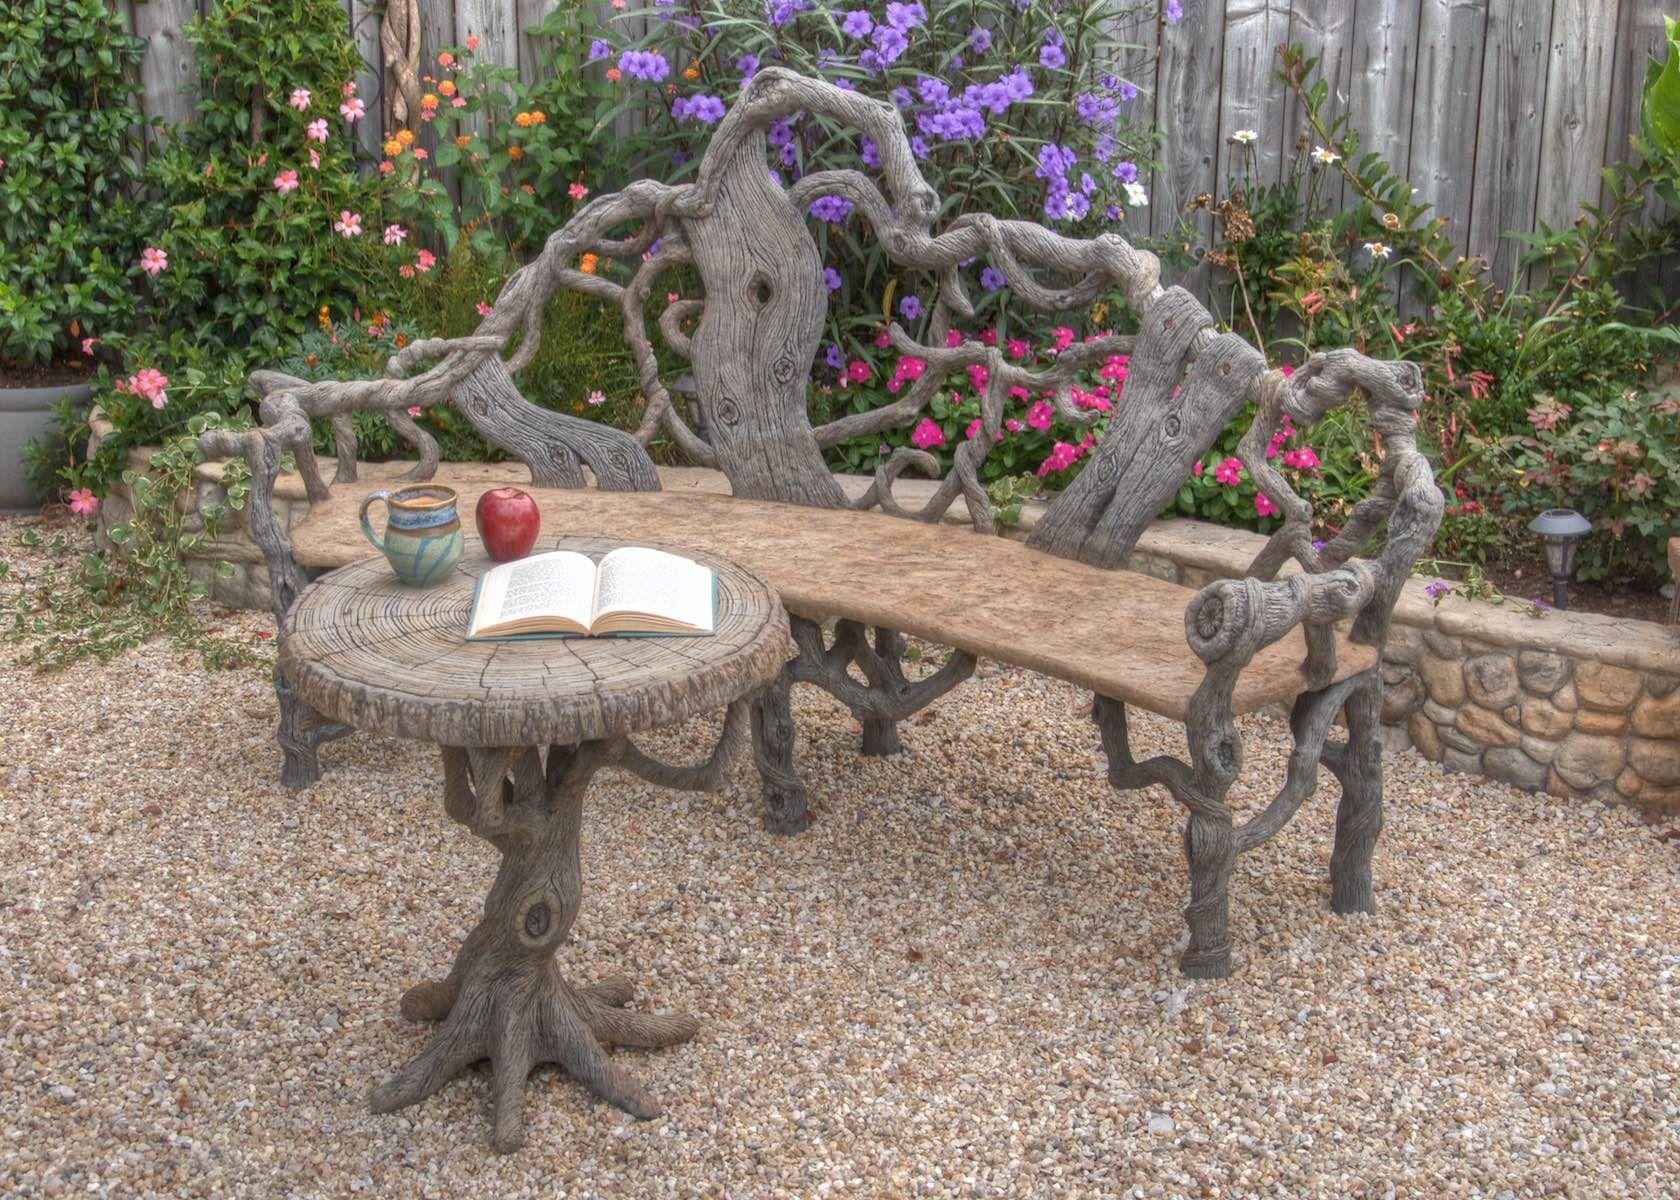 Concrete Faux Bois Outdoor Garden Furniture By Sculptor Diane Husson More